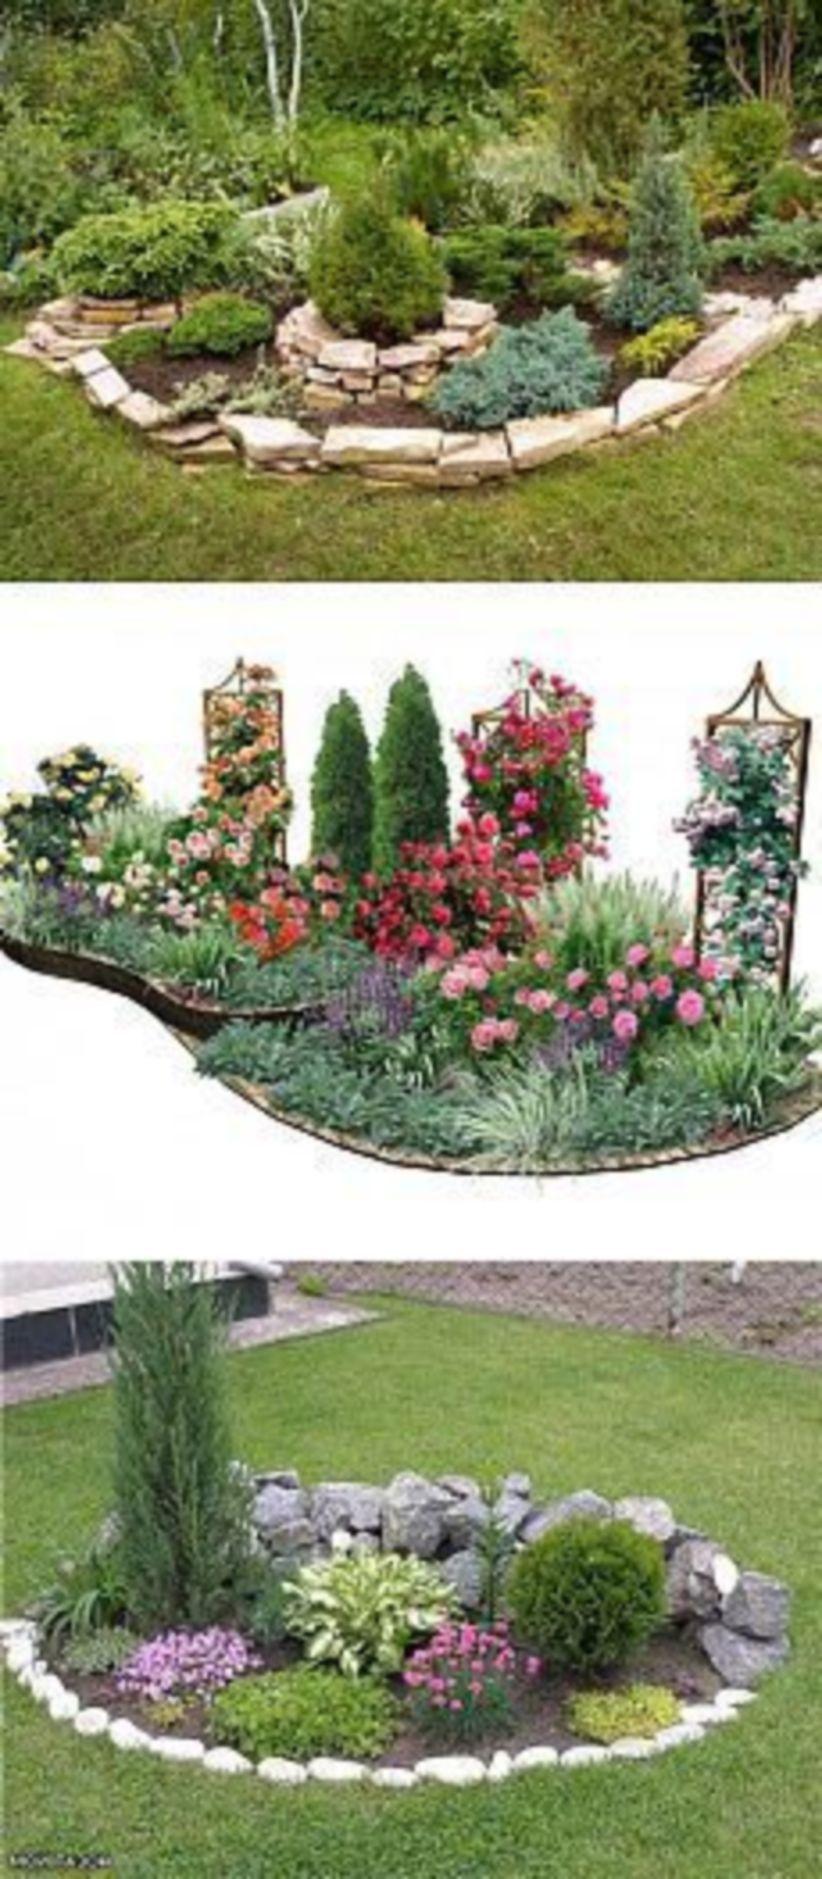 53 Cool Backyard Pond Design Ideas: 53 Great Front Yard Rock Garden Ideas